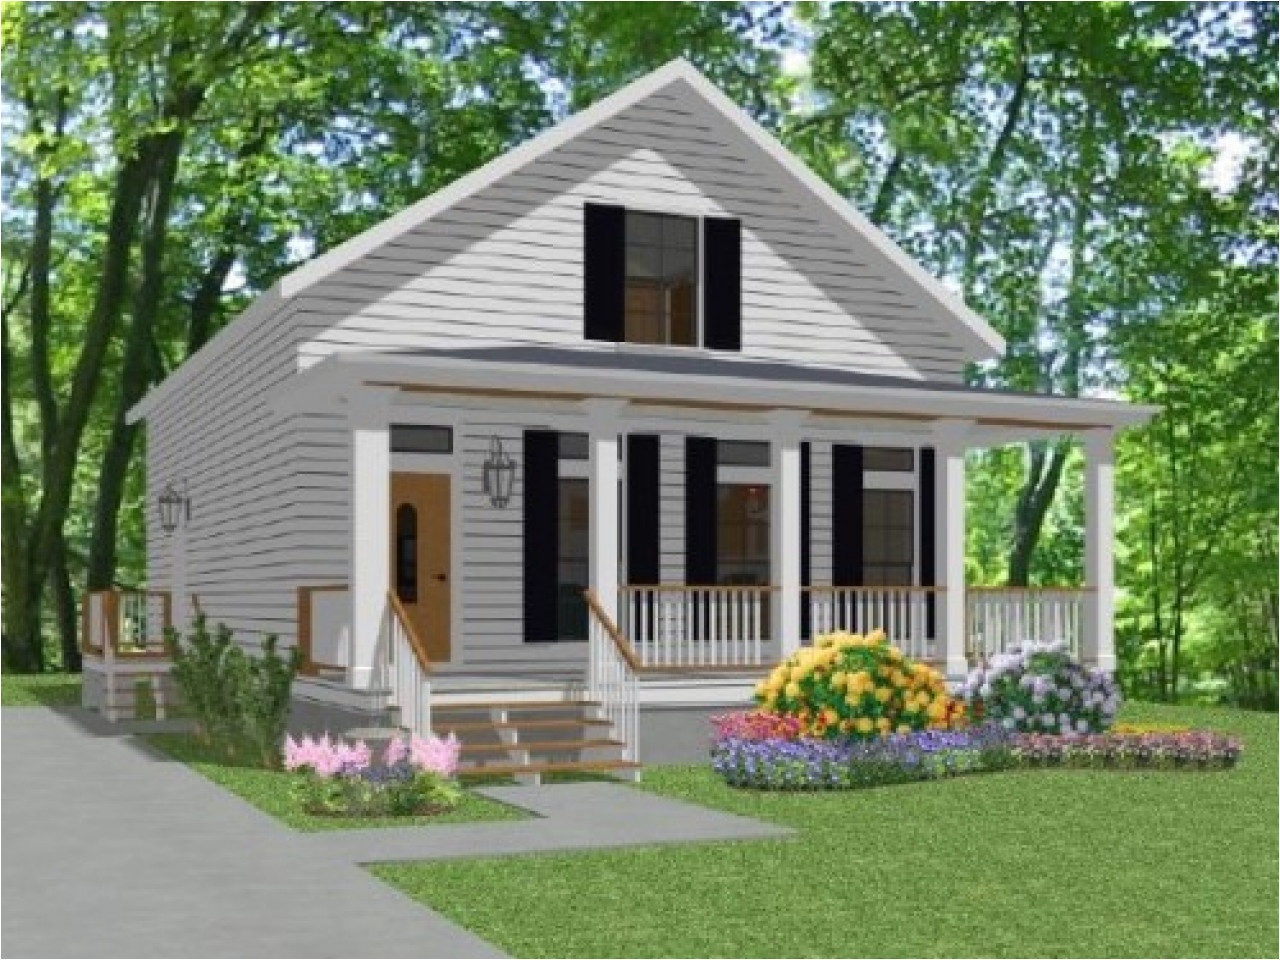 2773db8c0fa049e7 simple small house floor plans cheap small house plans